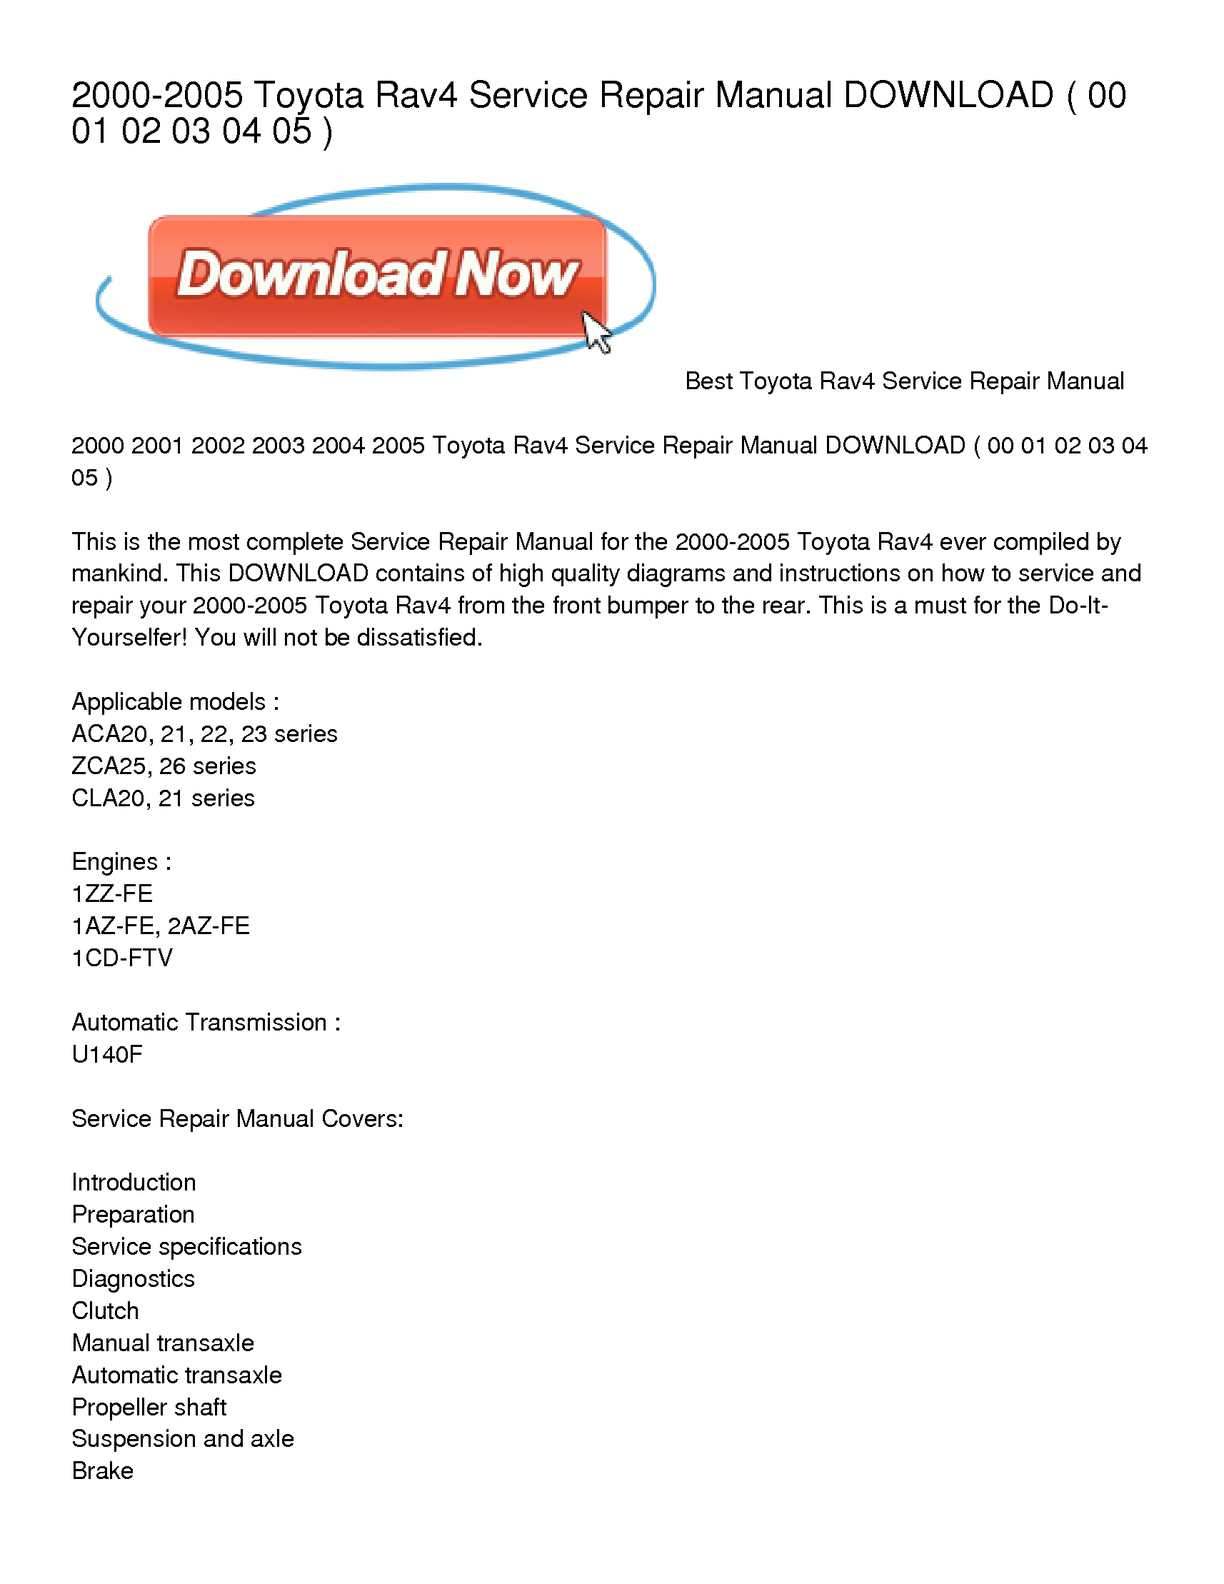 Toyota 2az Fe Engine Mechanical Service Manual Repair And 2004 Rav4 Diagram Calamo 2000 2005 Download